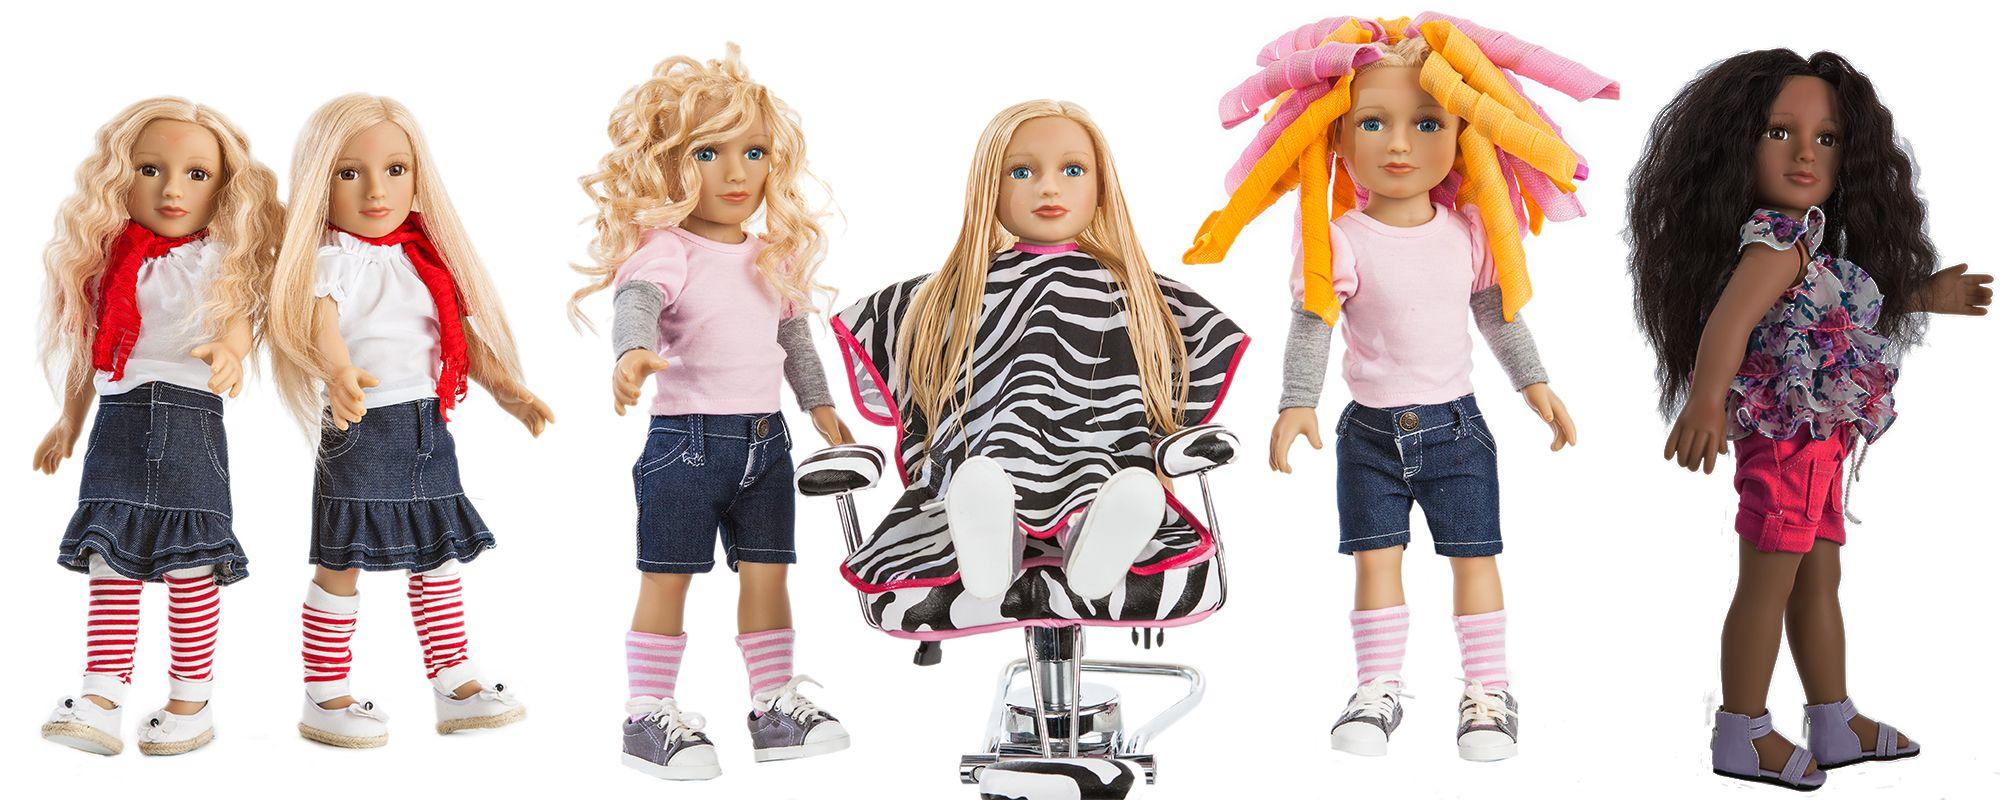 Dolls with Real Hair | My Salon Doll